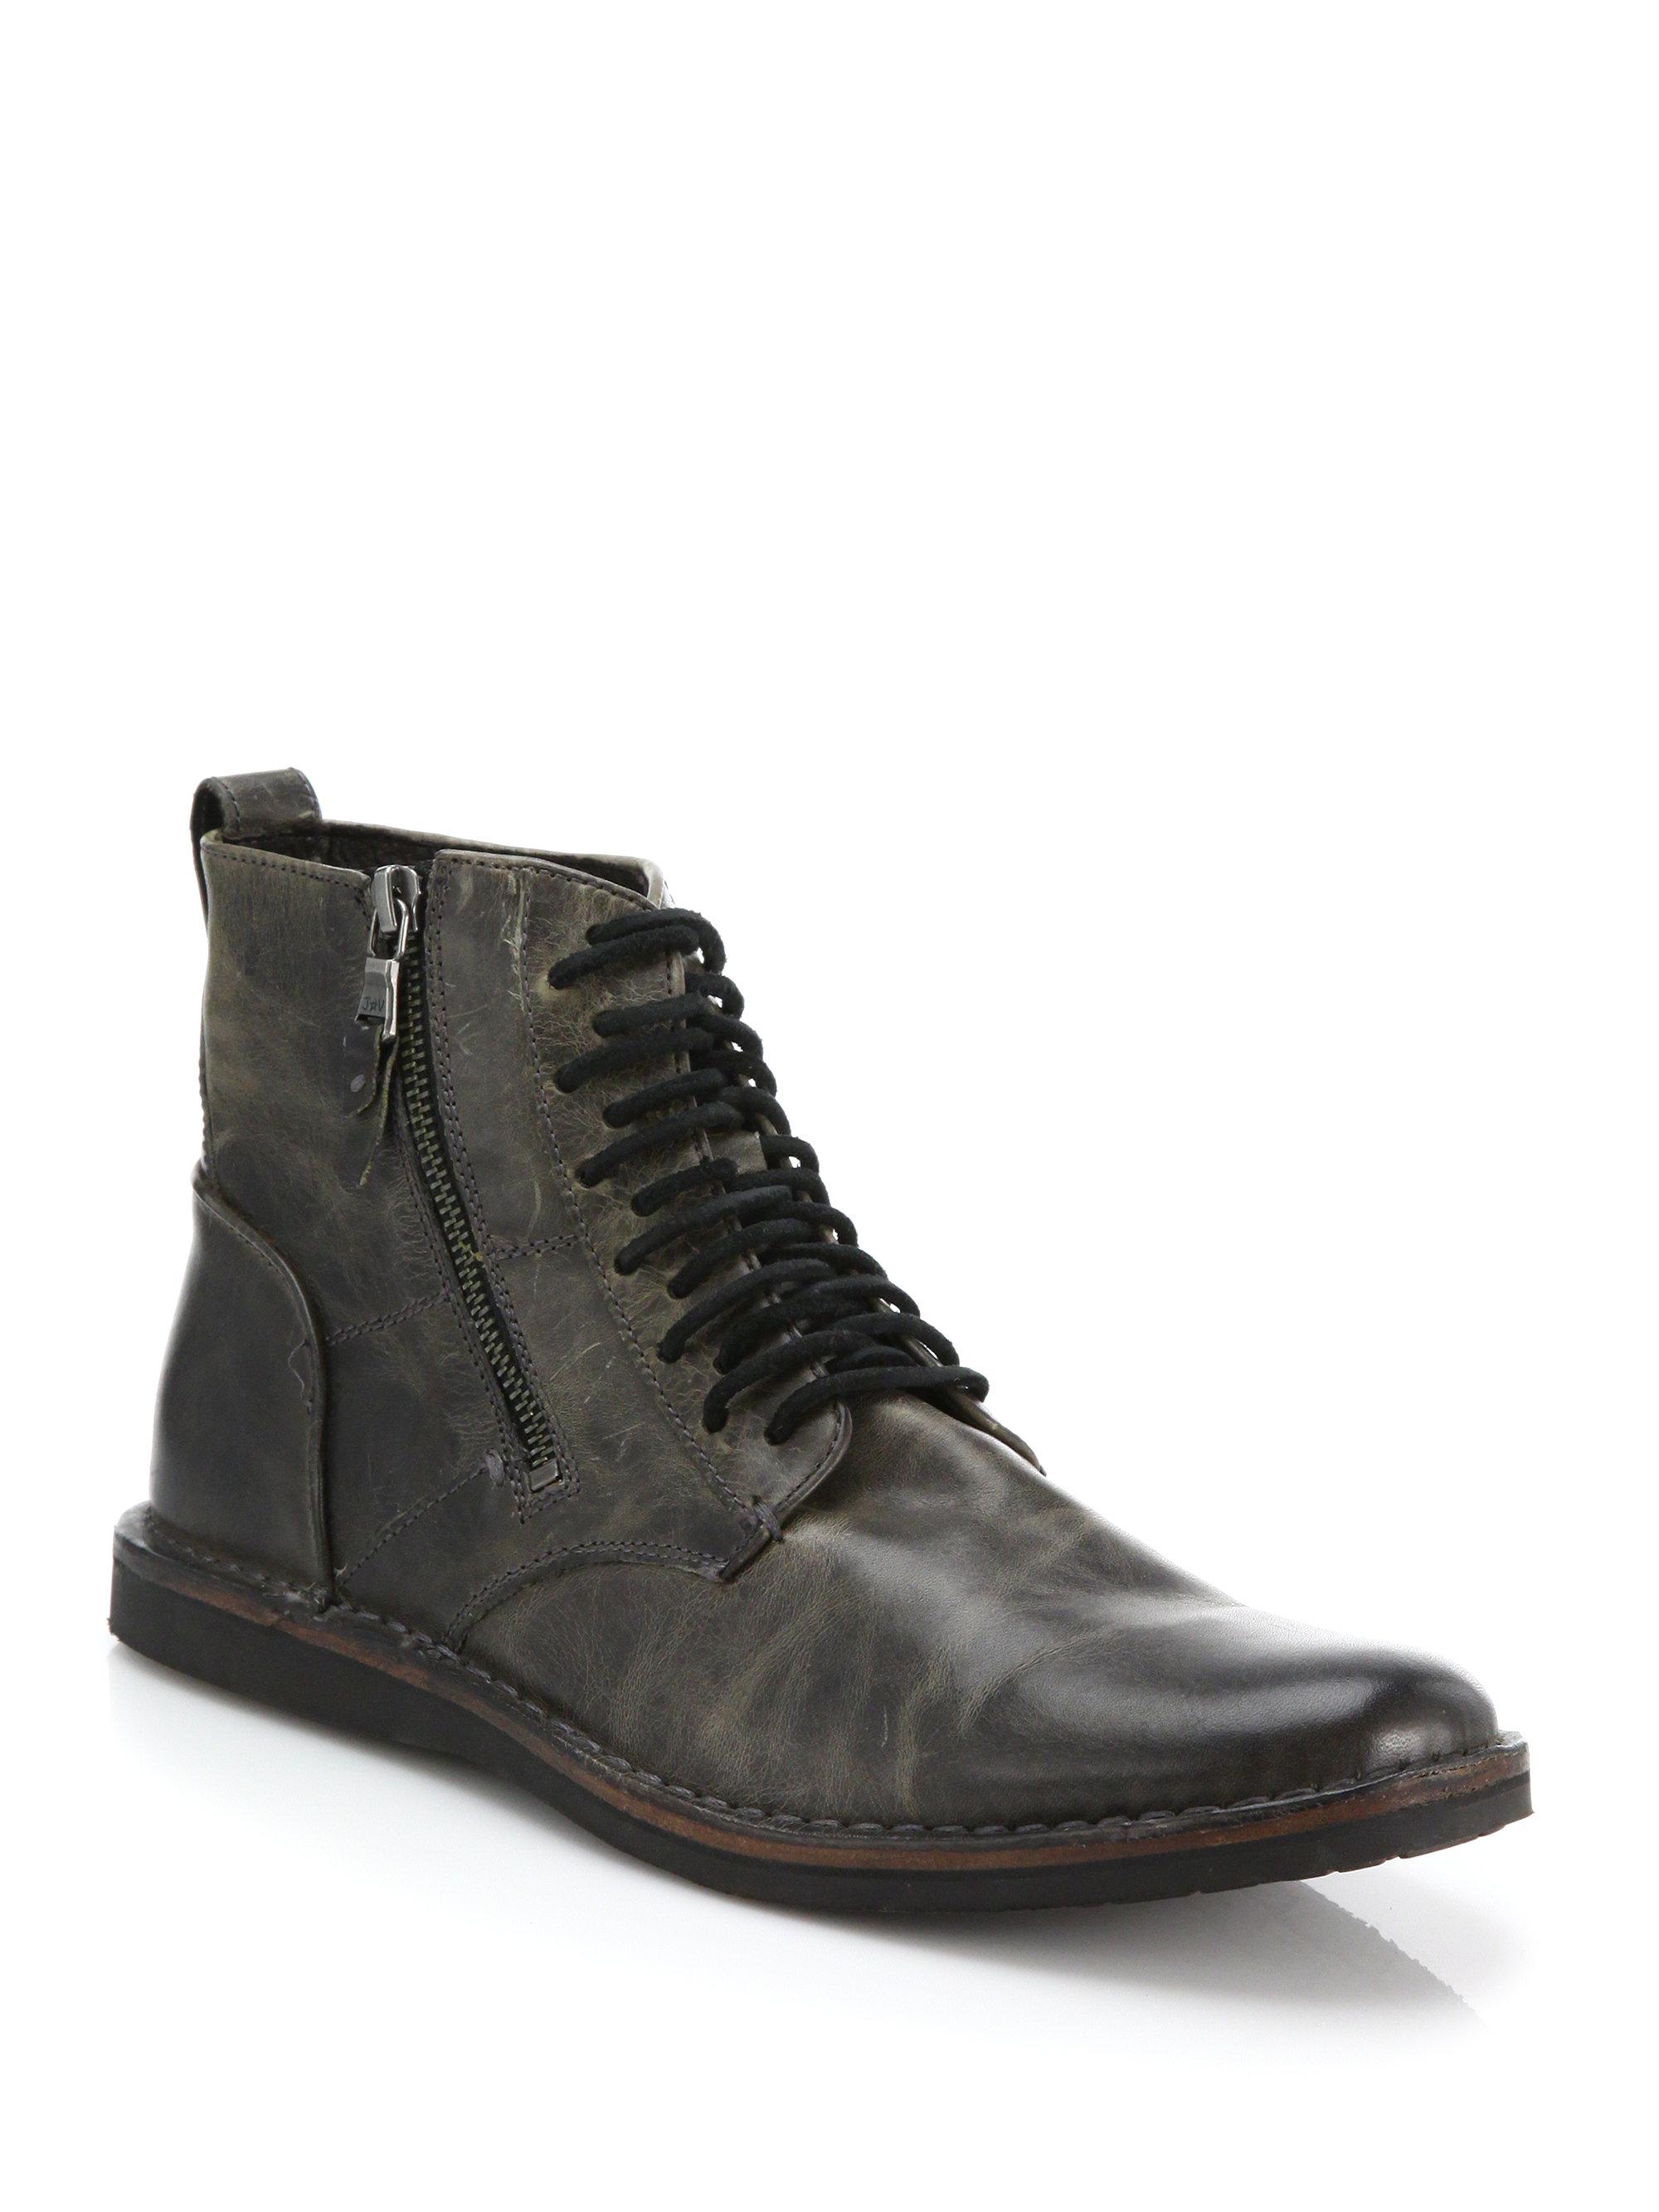 mens side zip snow boots national sheriffs association